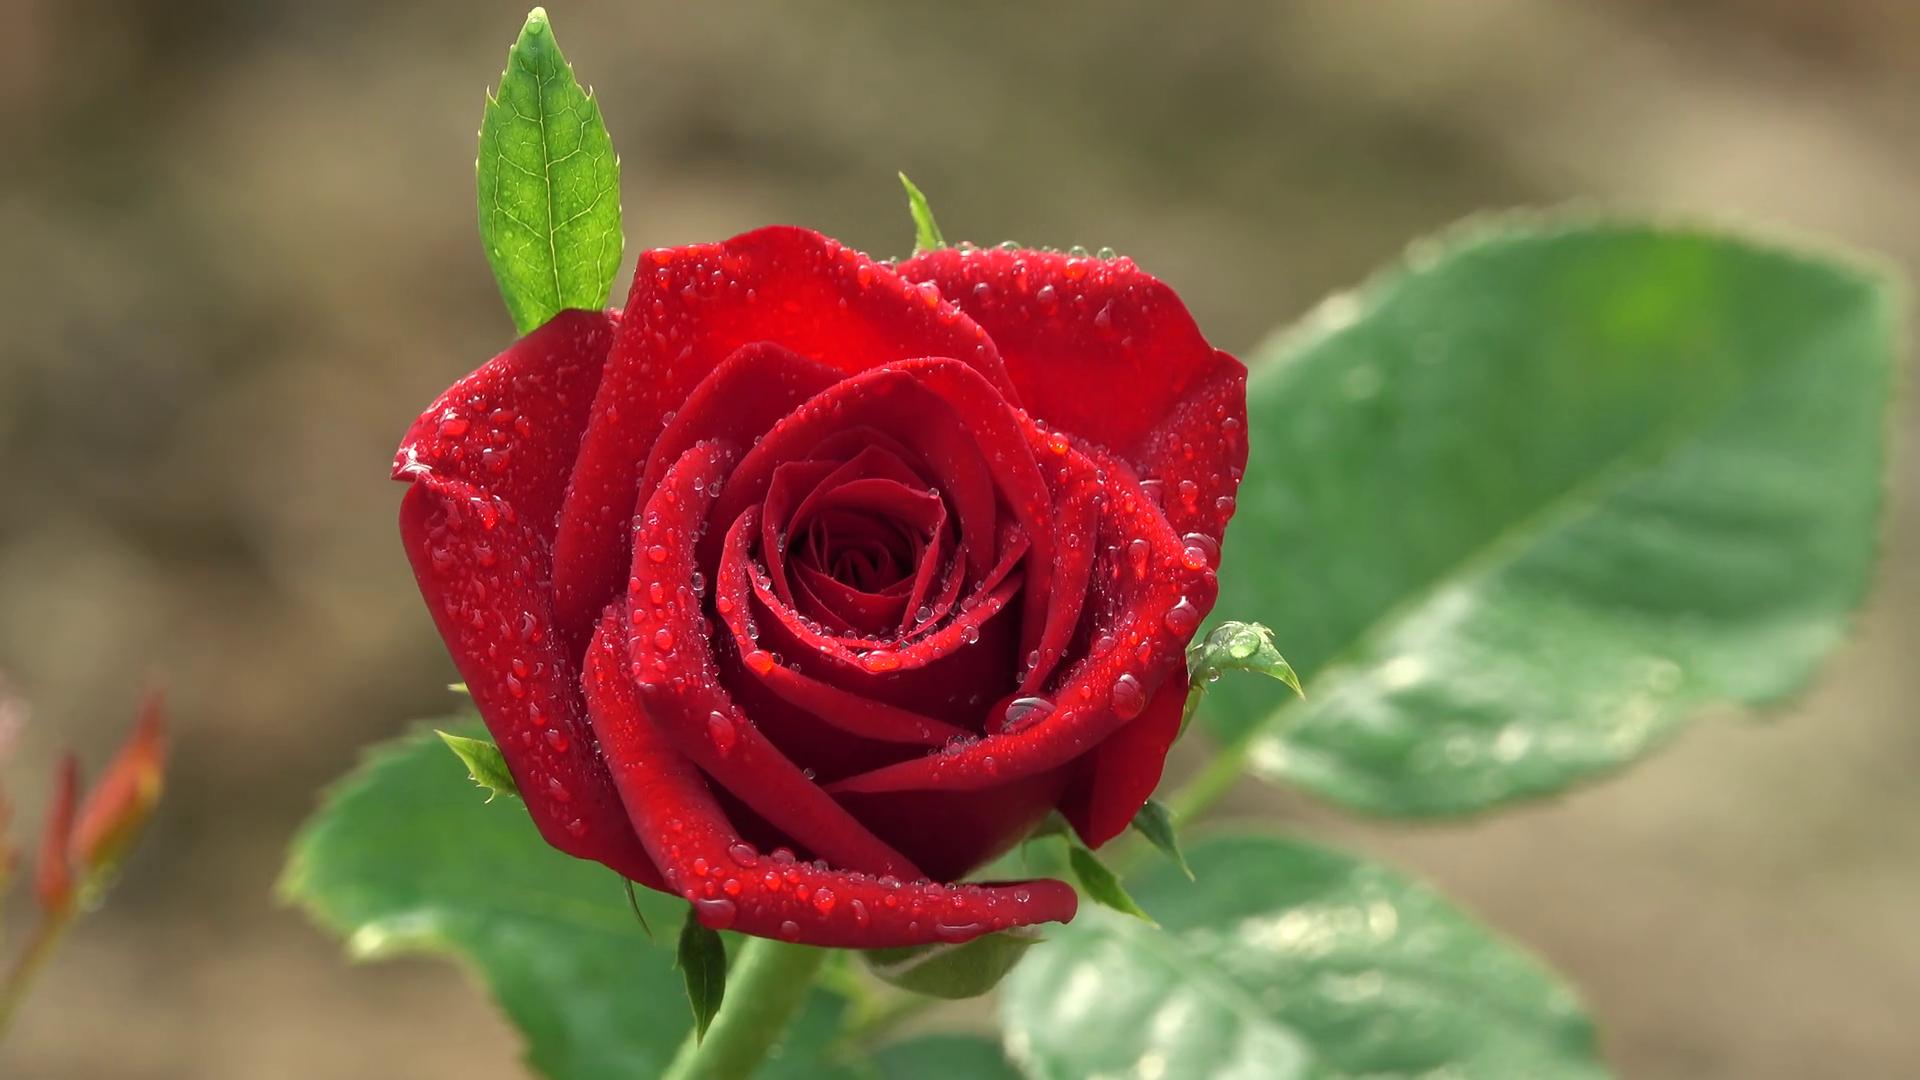 Most Beautiful Red Rose Closeup with Water Drops 4K Nature Bokeh ...